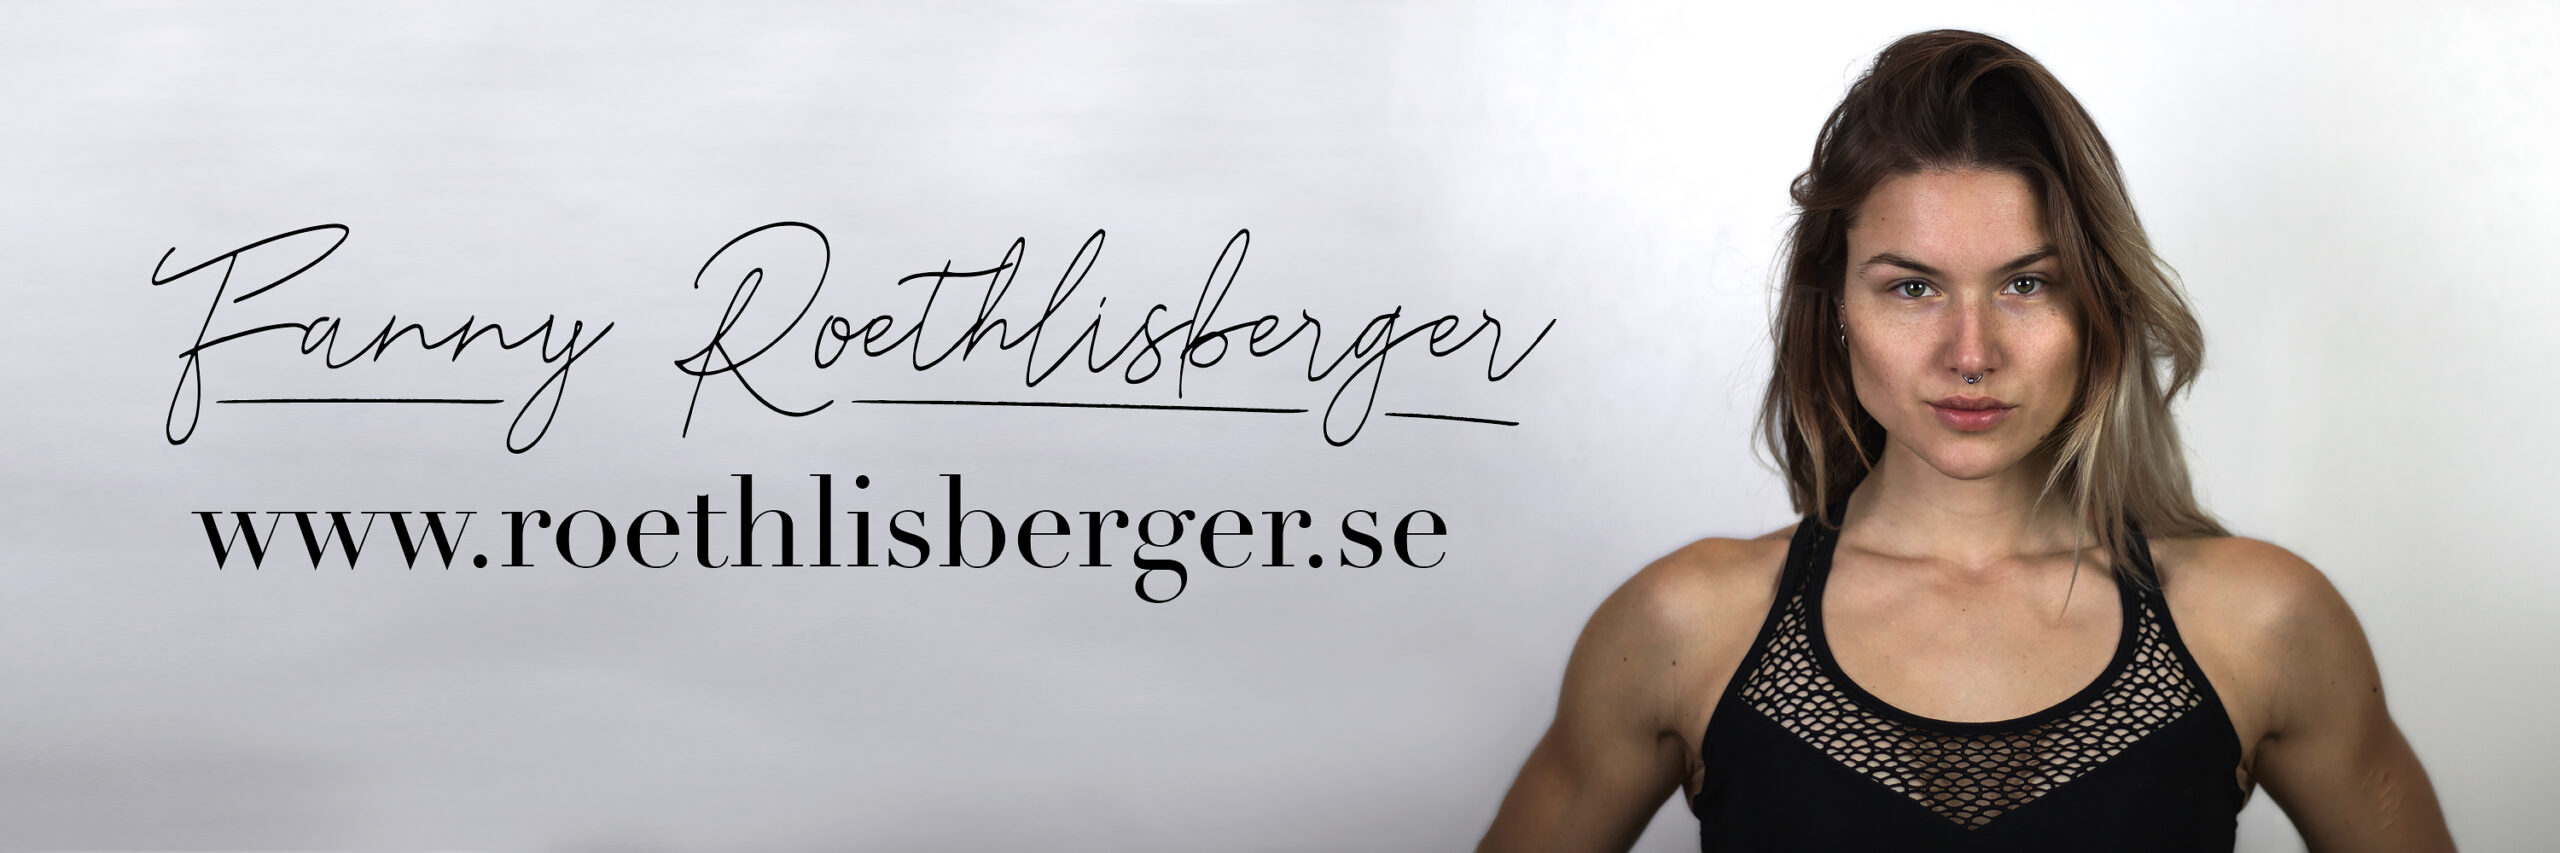 Roethlisberger.se